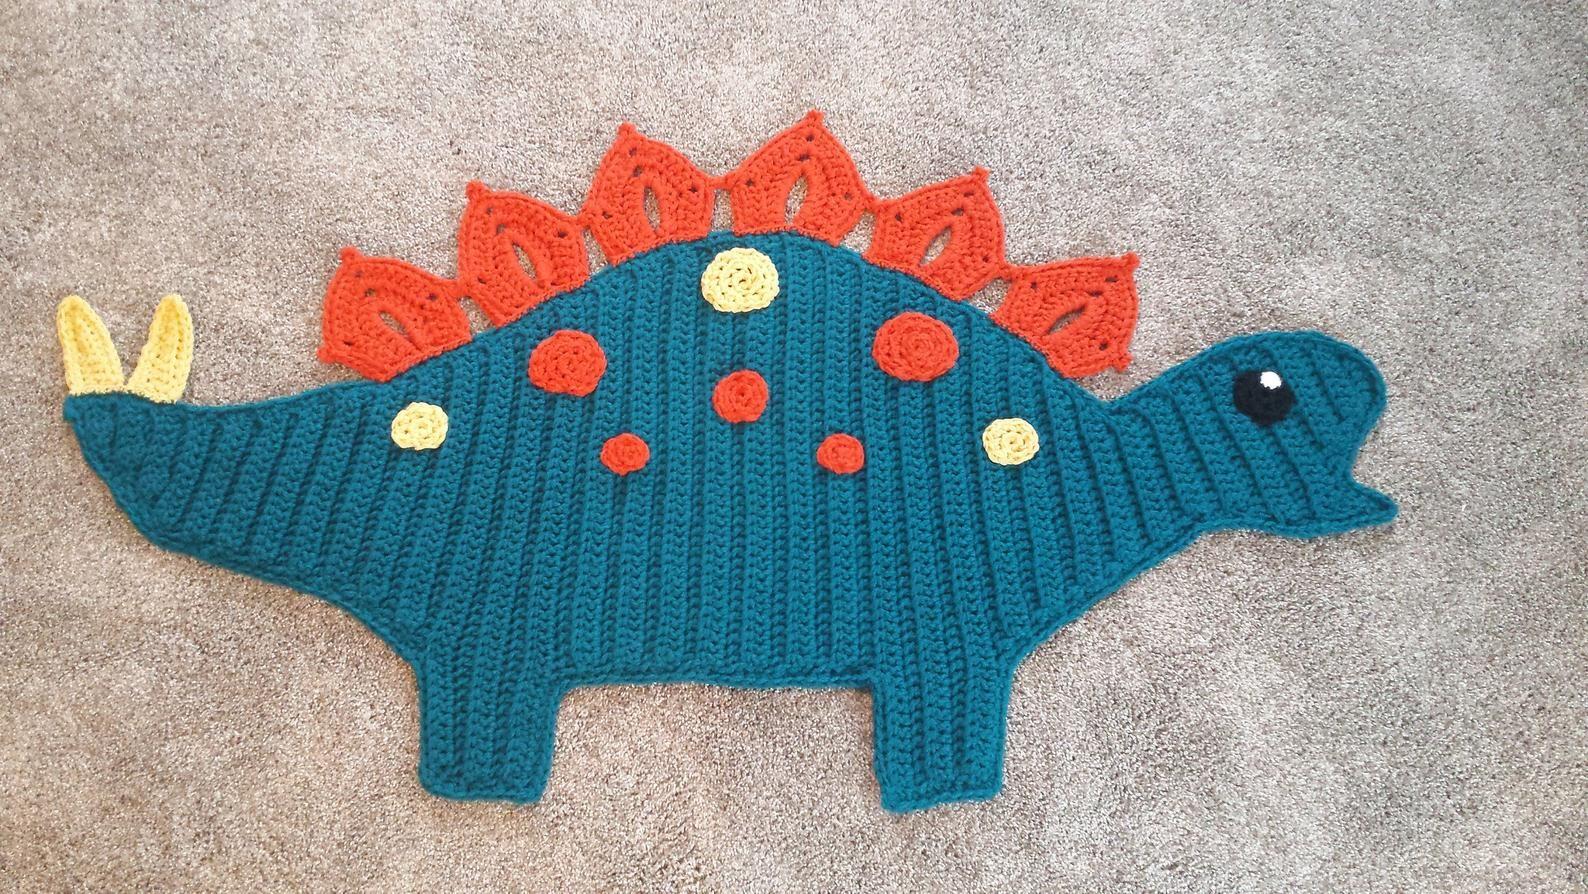 Crochet Dinosaur Rug Stegasaurus Nursery Rug Rawr Etsy In 2020 Crochet Dinosaur Dinosaur Rug Crochet